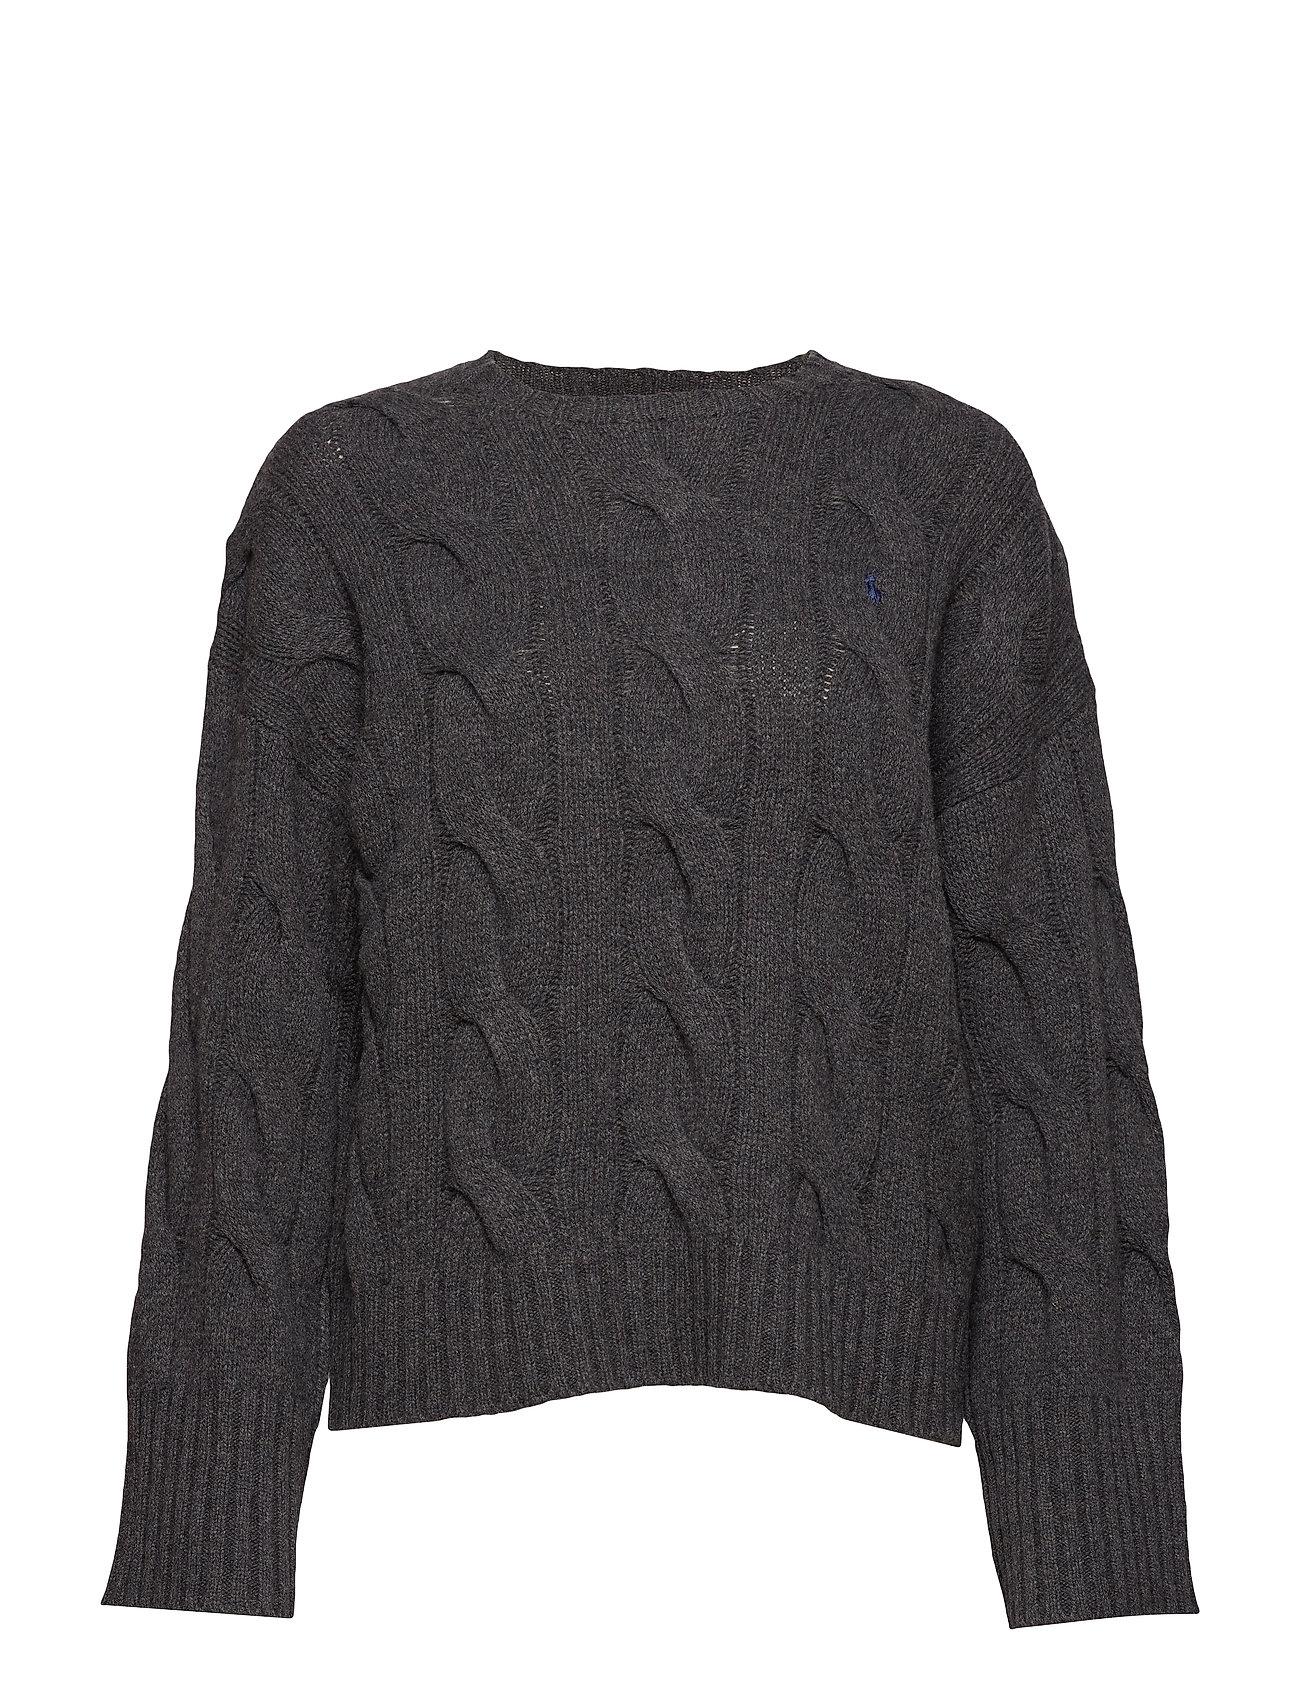 Dolman Ralph Lauren Wool HeatherPolo Sweaterbristol WEH9IbeYD2